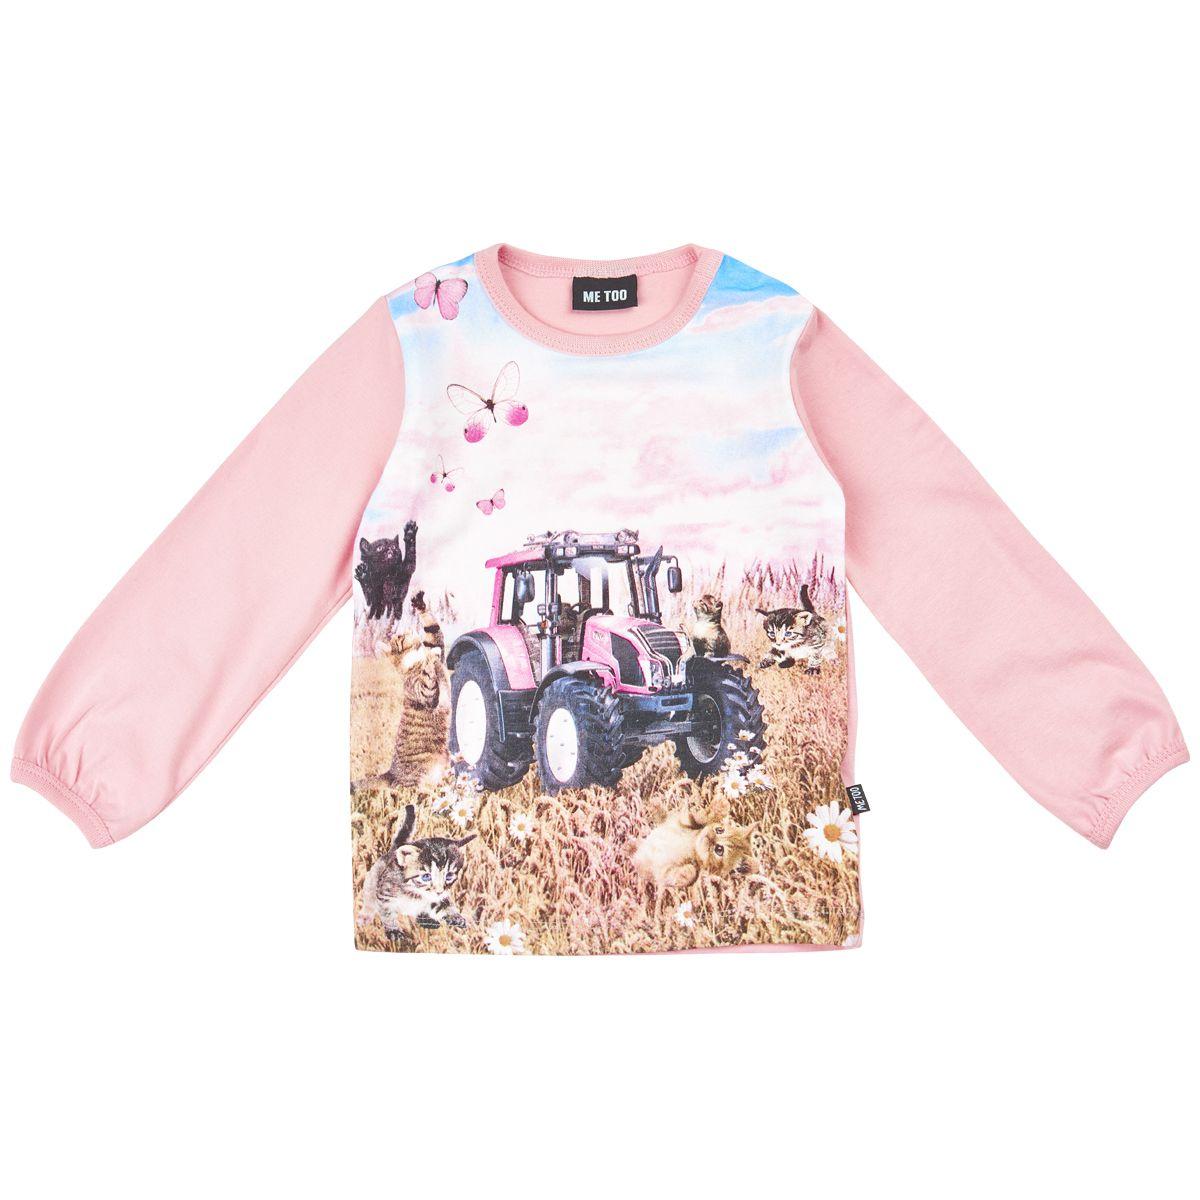 62017c26 Traktorgenser str. 80-116   Me too barneklær   Graphic sweatshirt ...